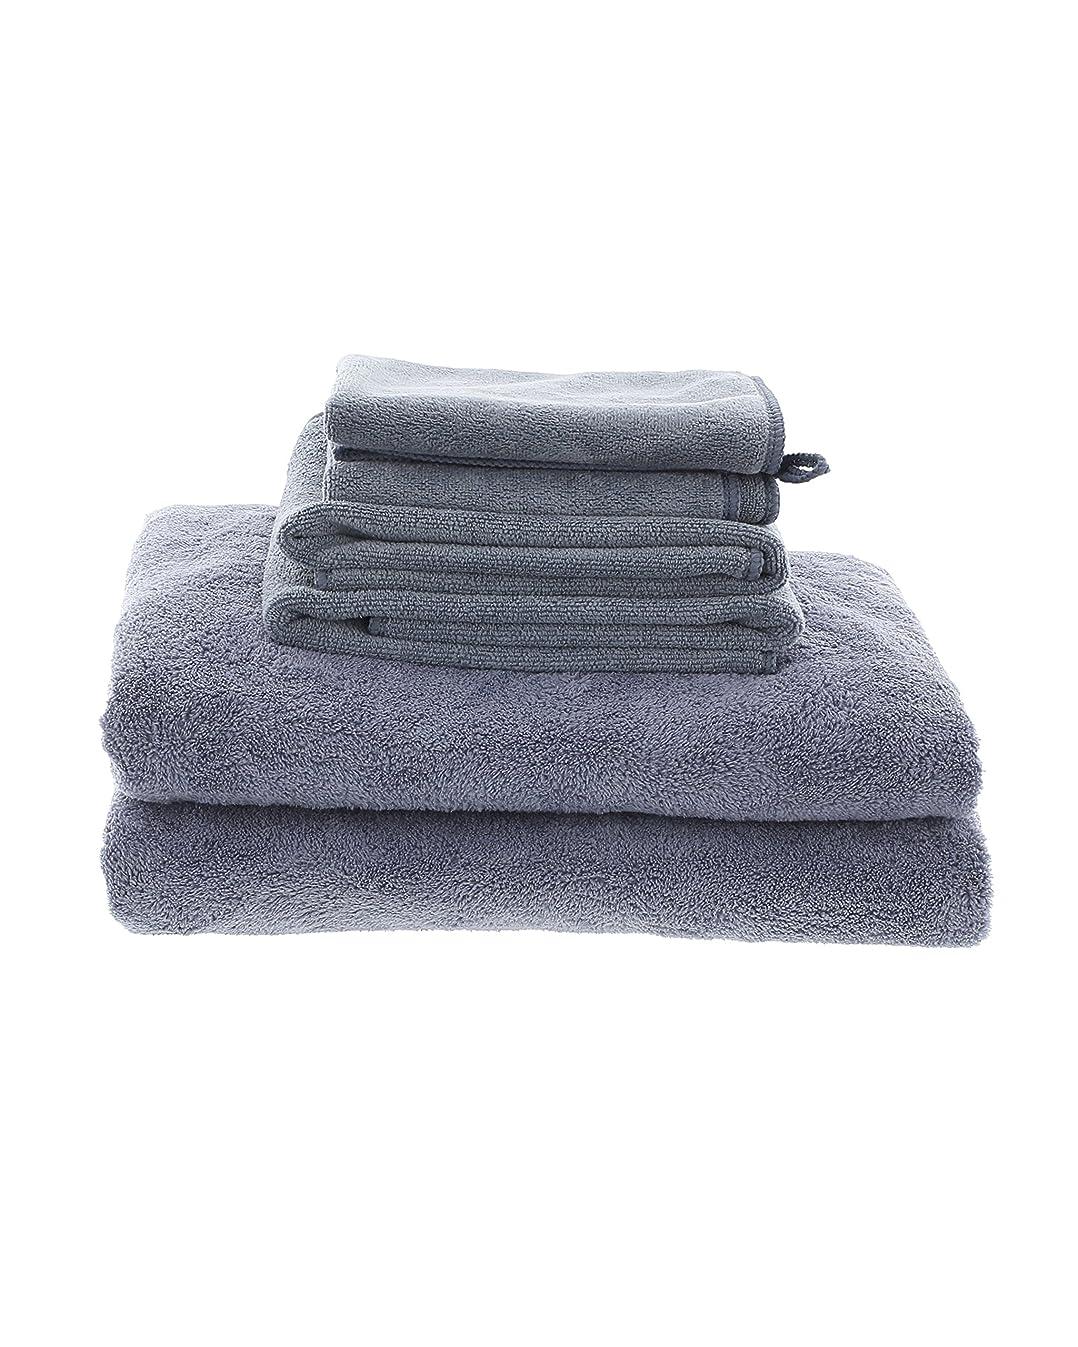 Best Grey MojaFiber Microfiber Bath Combo Bath Towel (2) | Hand Towel (2) | Face Cloth (2)